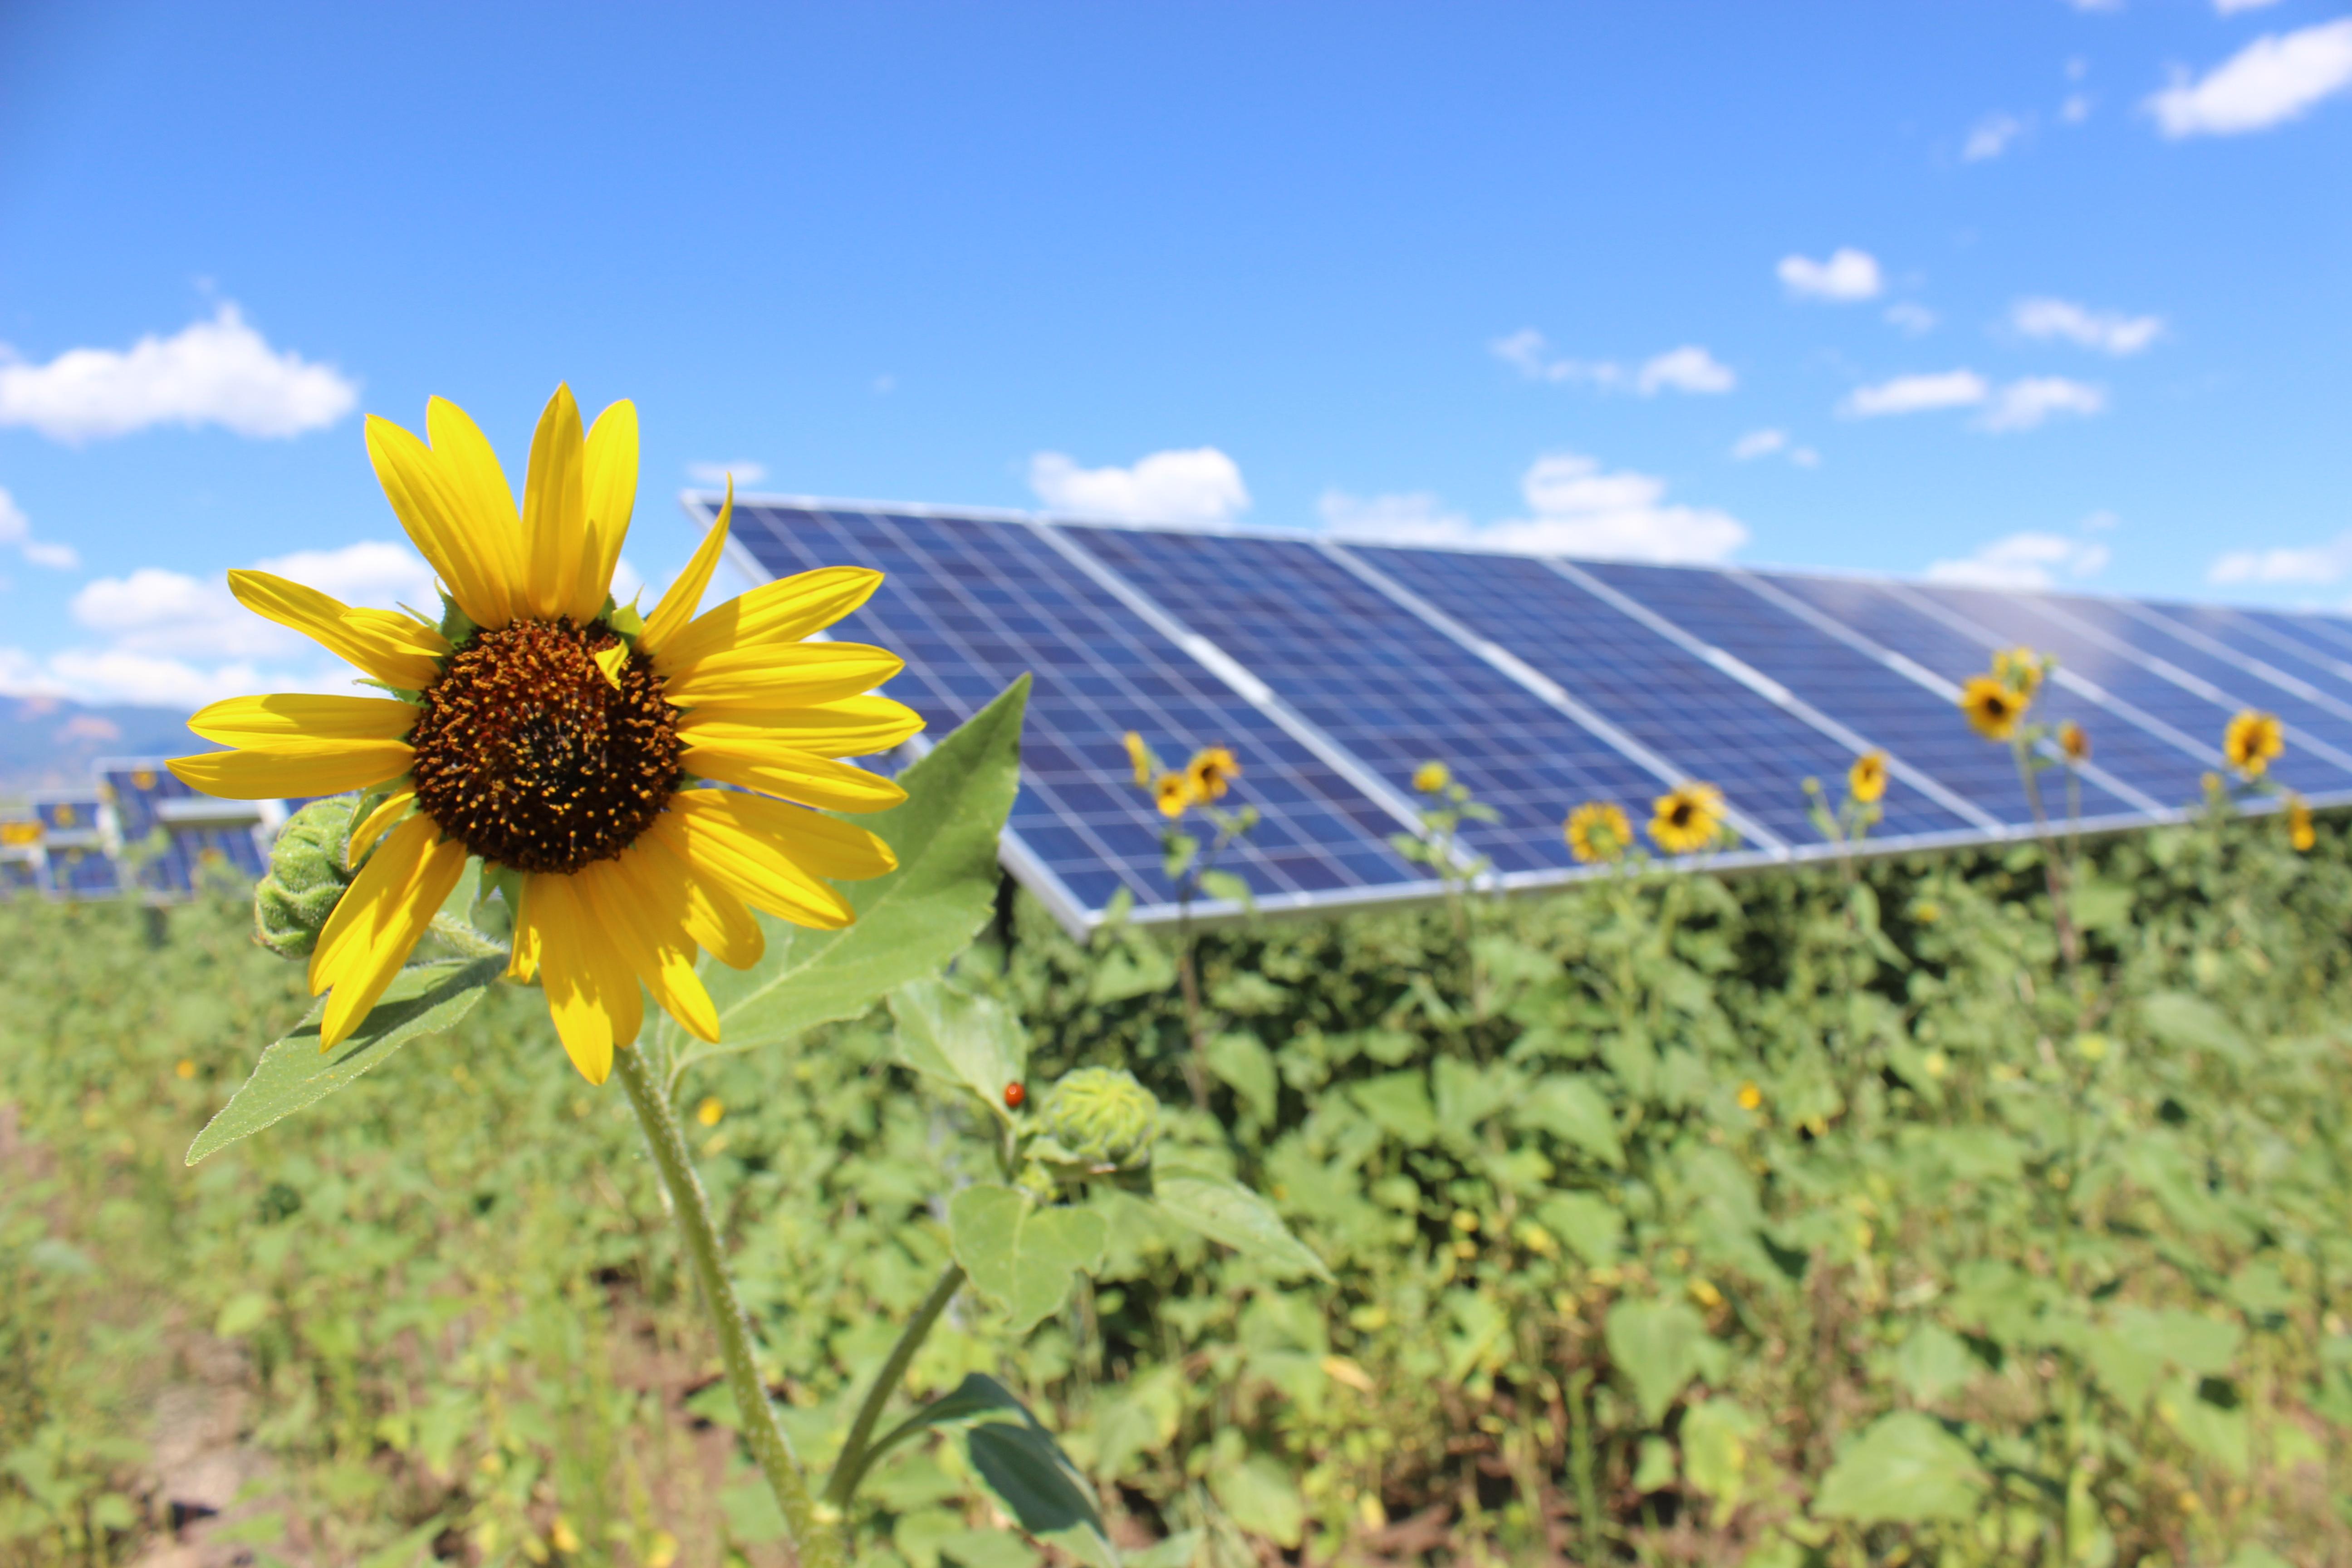 SunShare adds 4.5 MW of Community Solar to Minnesota Energy Market